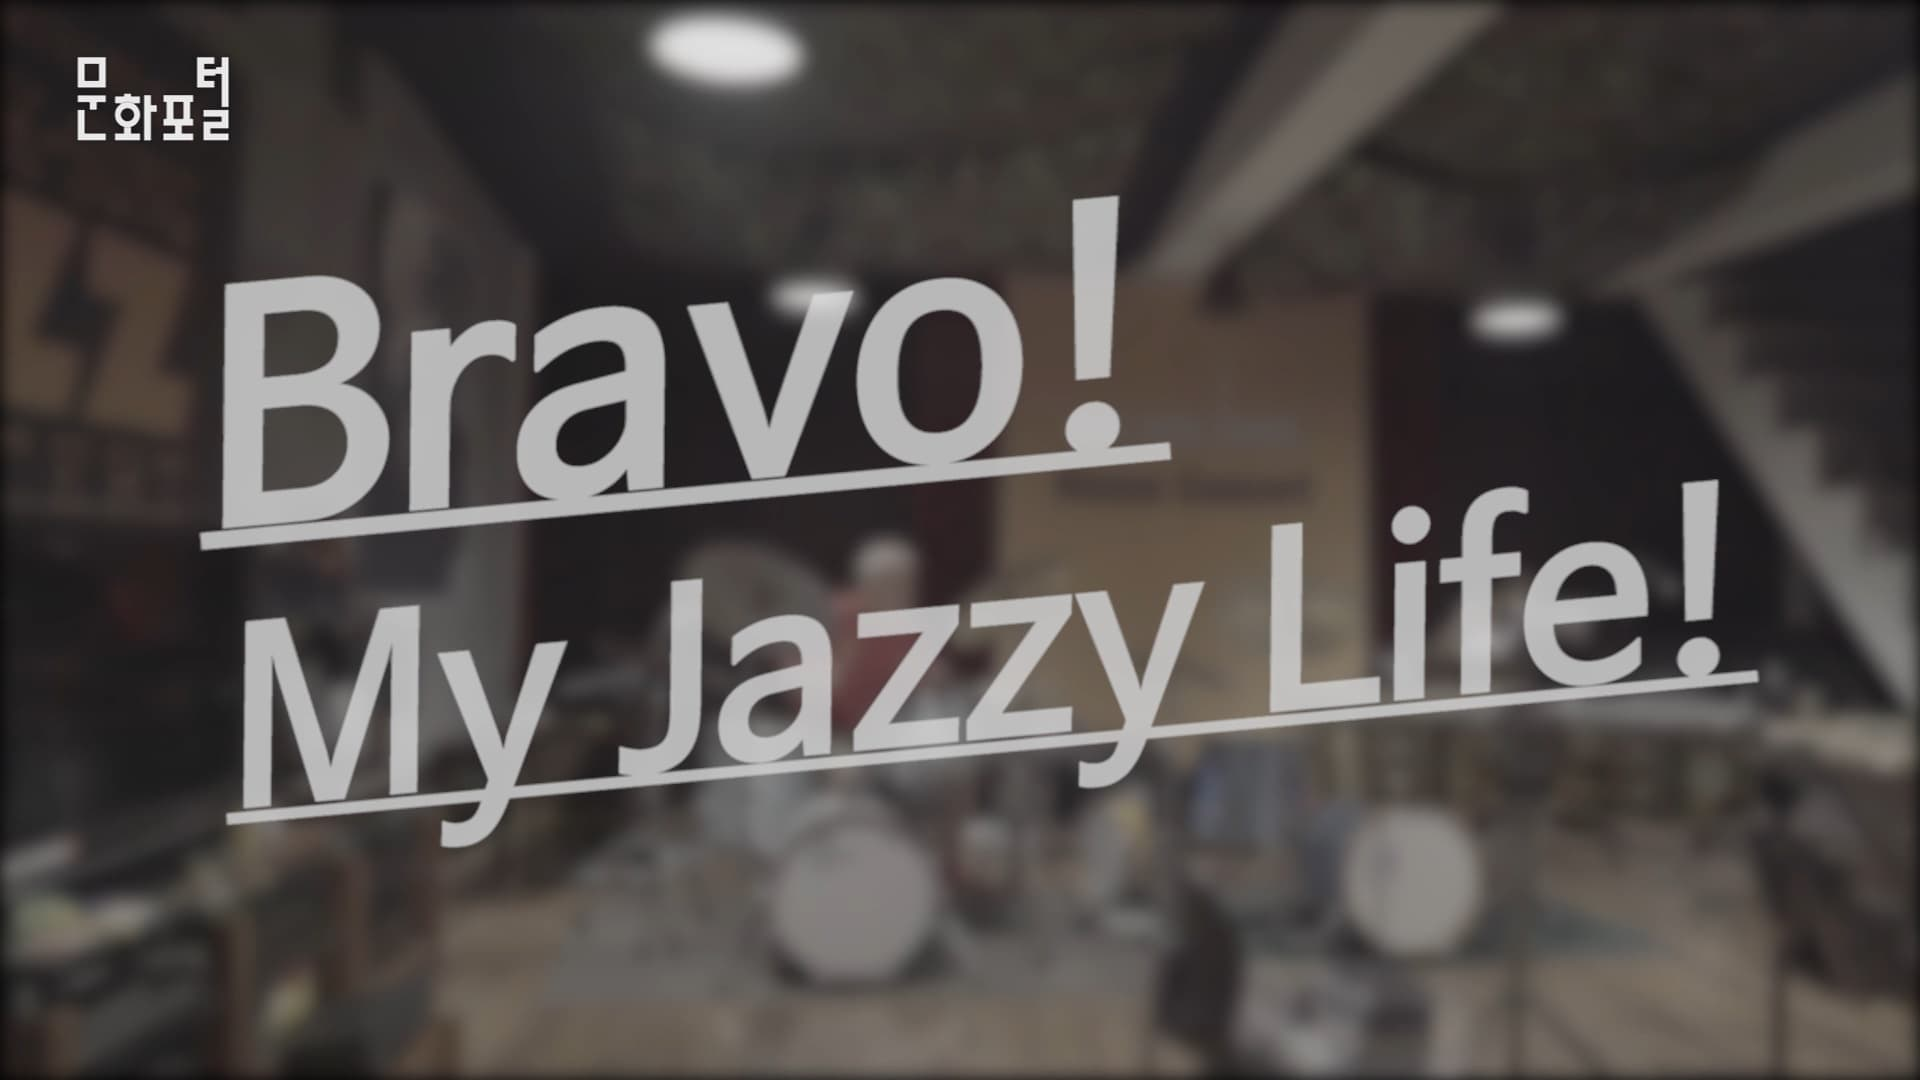 Bravo! My Jazzy Life, 류복성